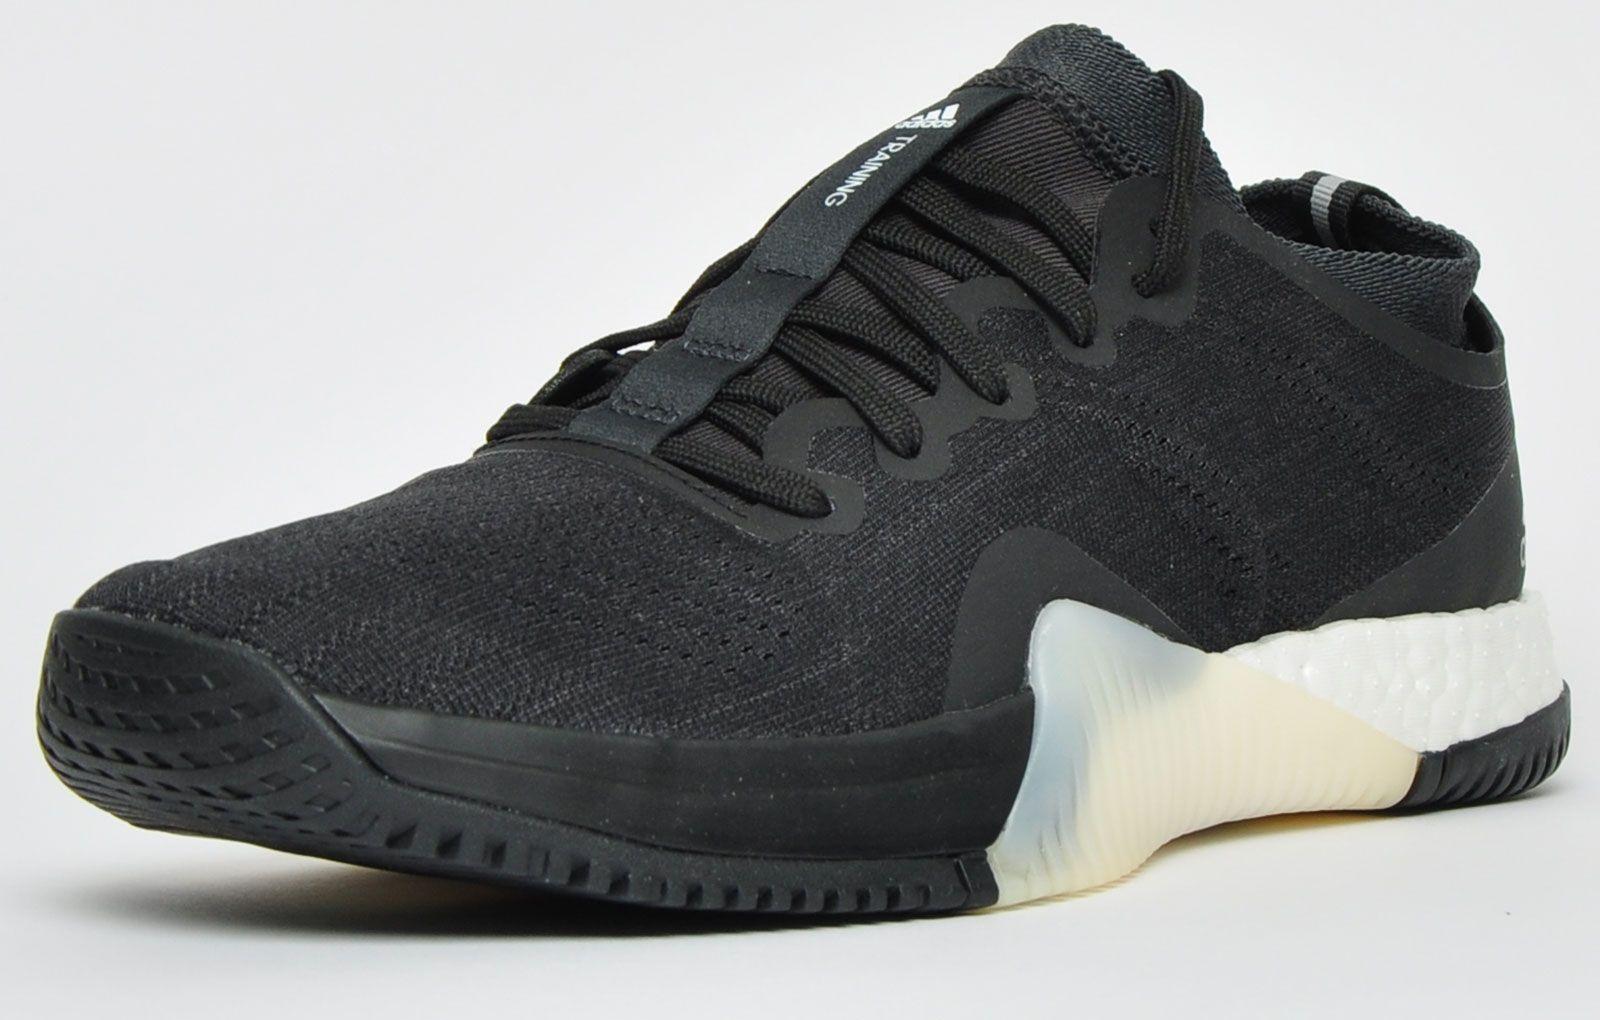 Adidas CrazyTrain Elite Boost Mens